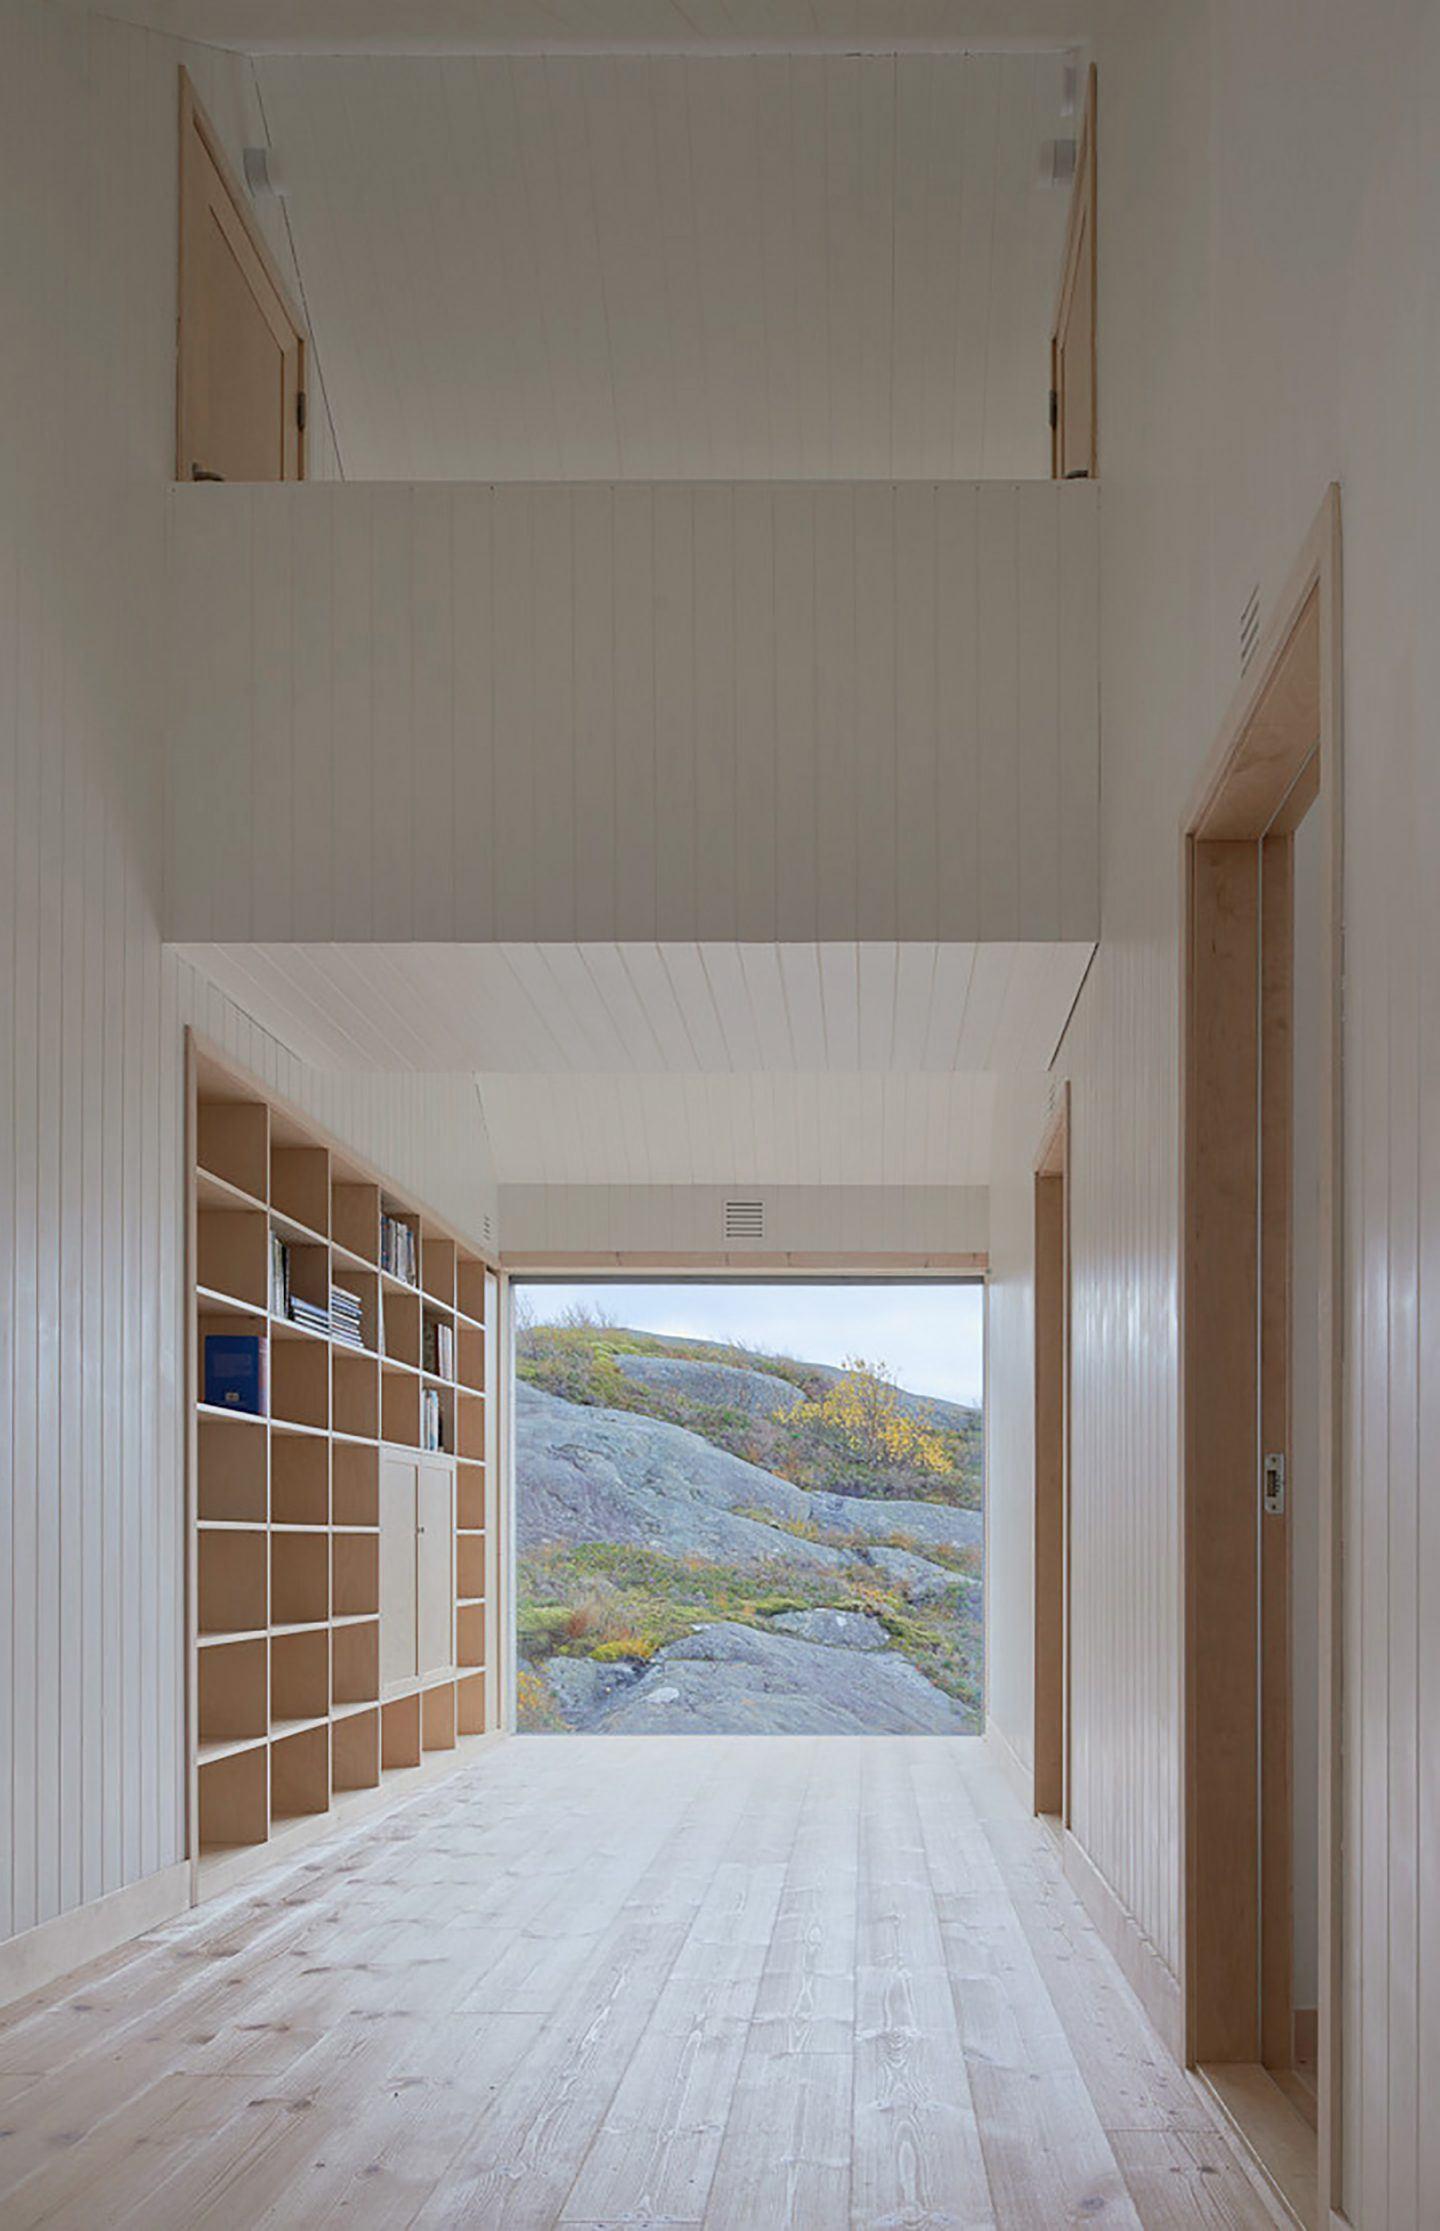 IGNANT-Architecture-Kolman-Boye-Vega-Cottage-6